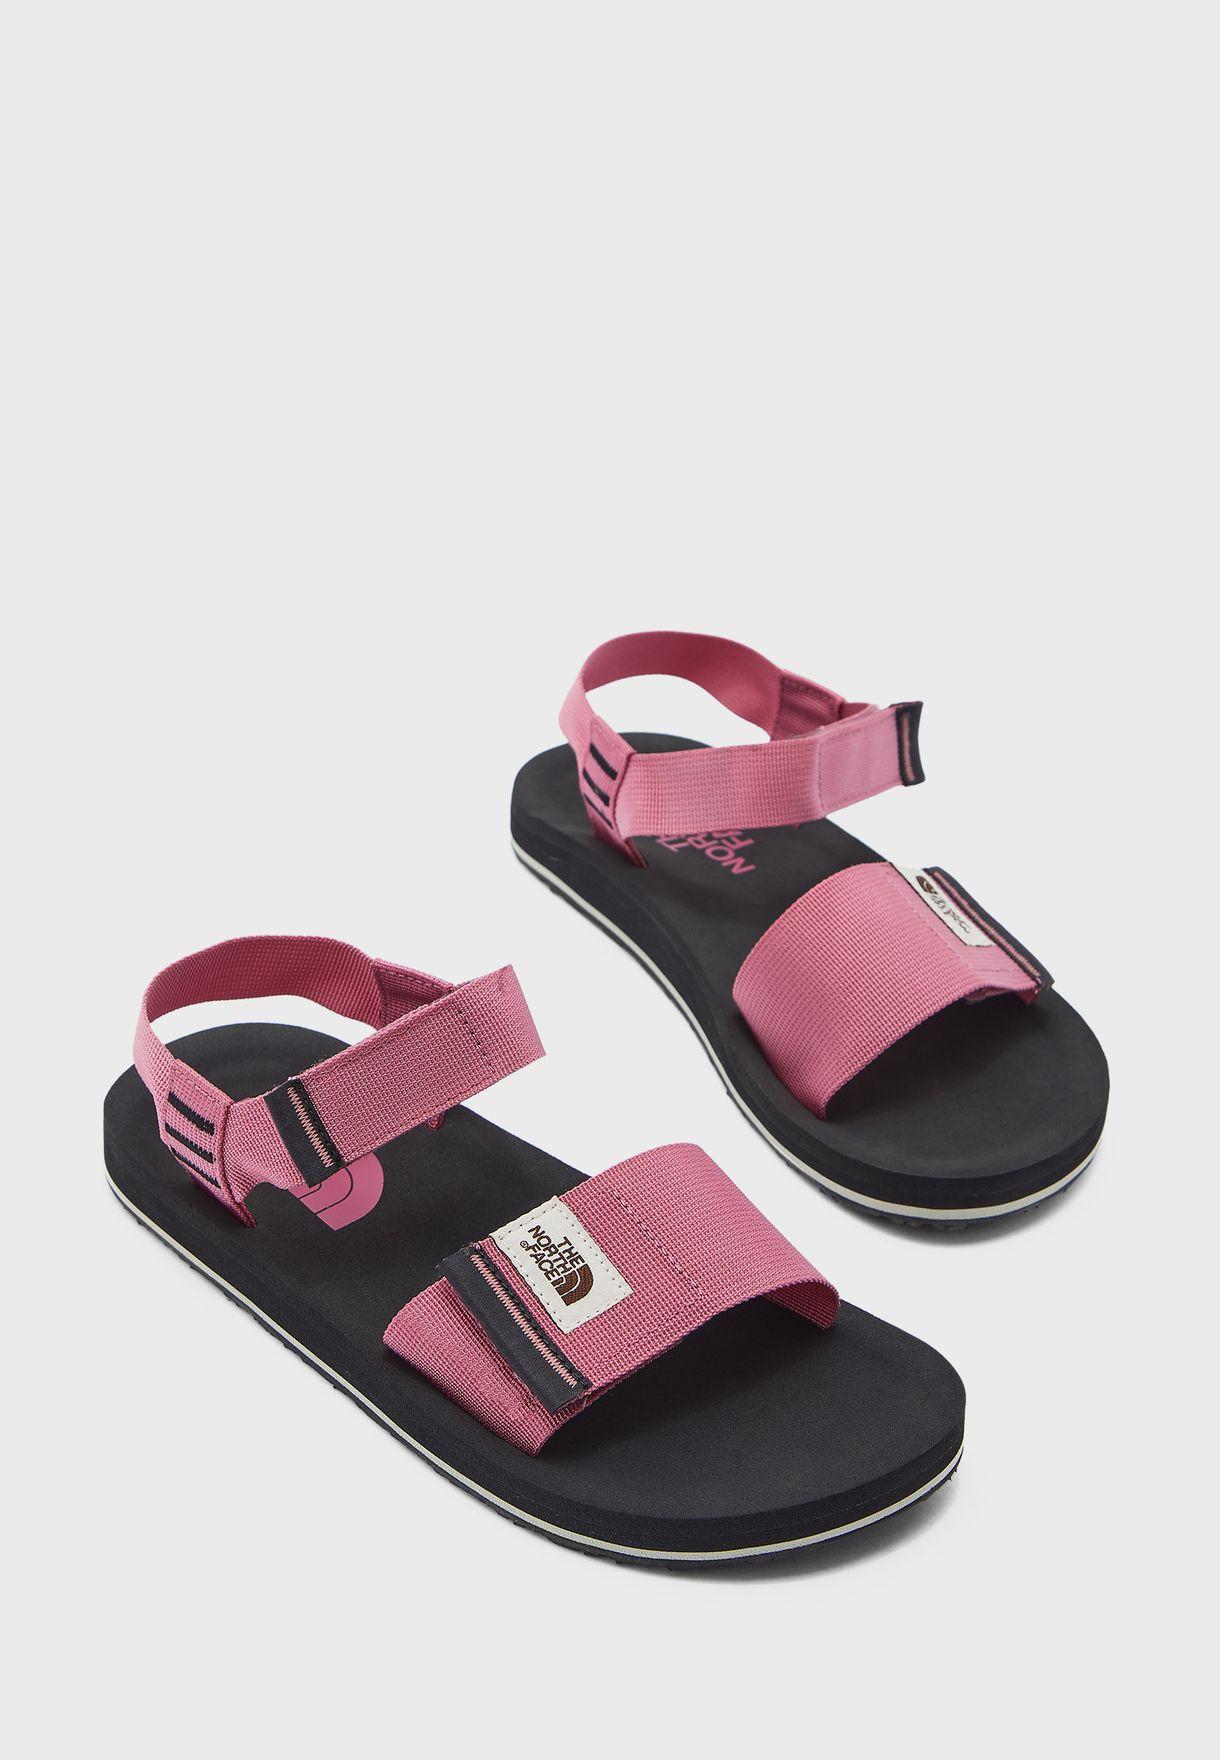 Buy The North Face pink Skeena Sandal